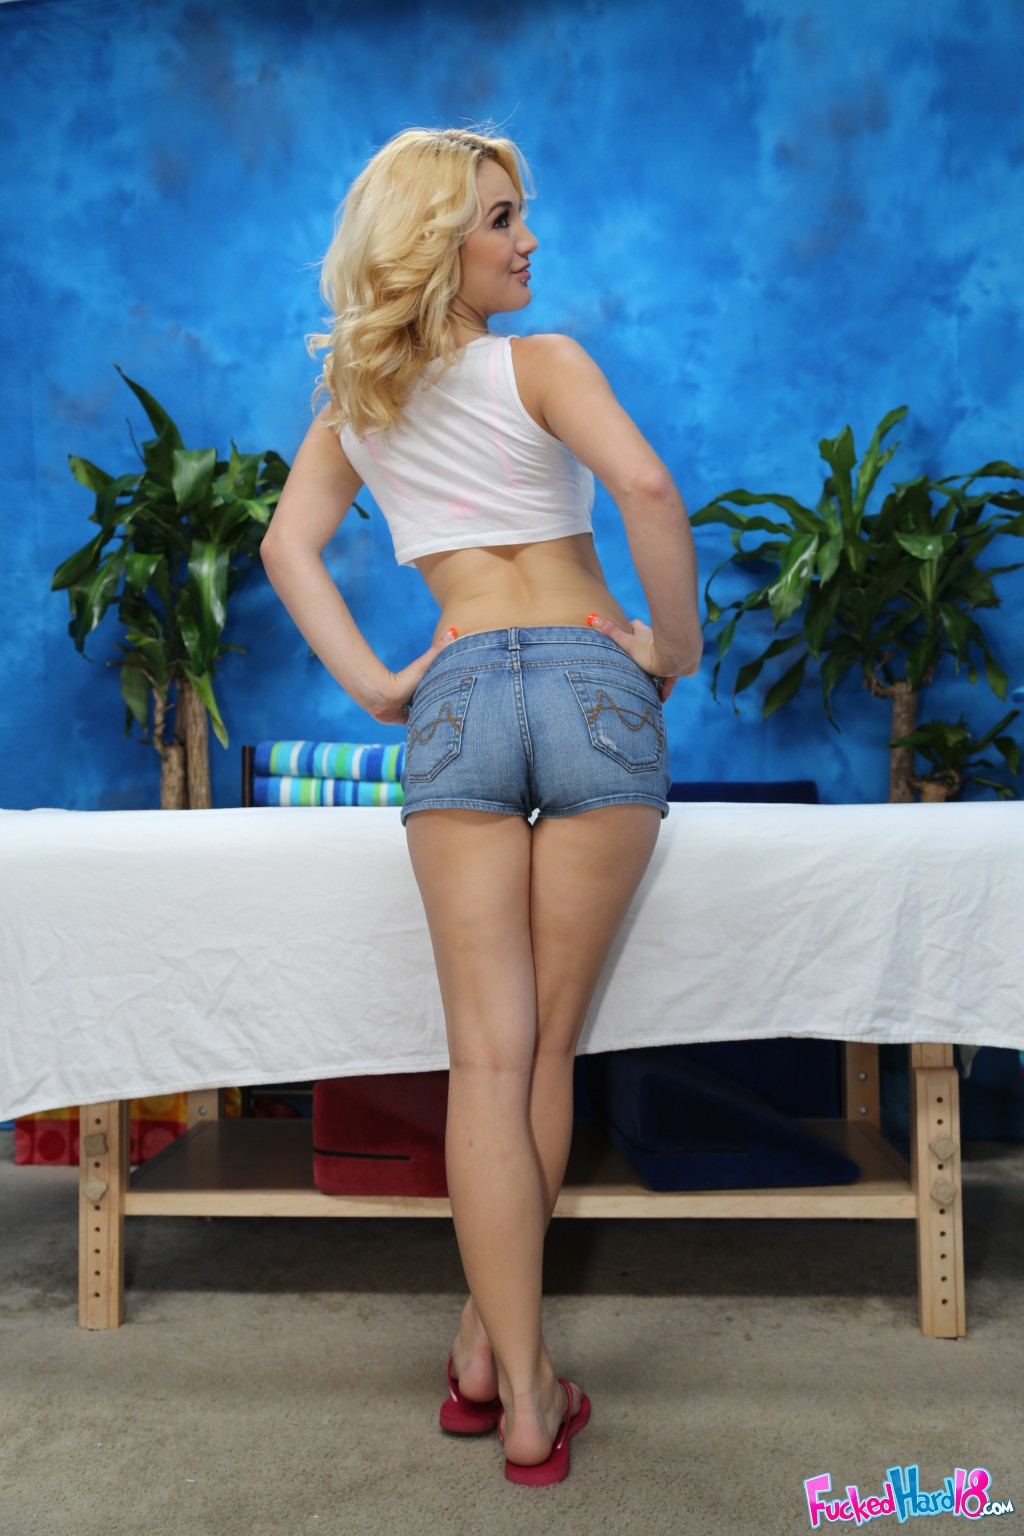 Hot Blonde Fucked Leggings